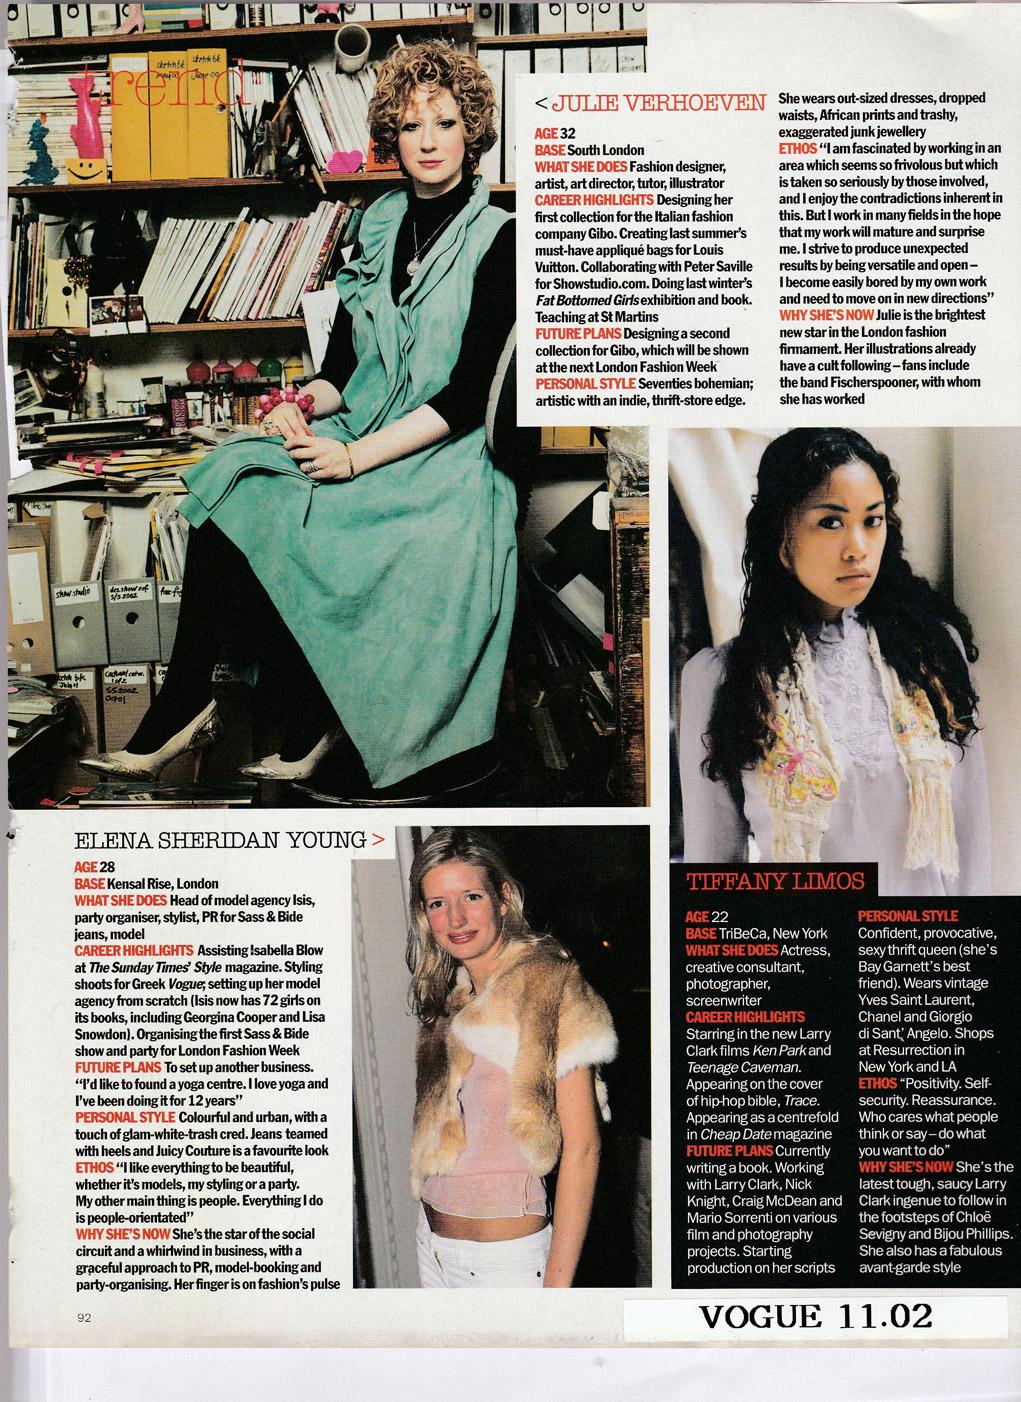 JulieVerhoeven_Vogue2002